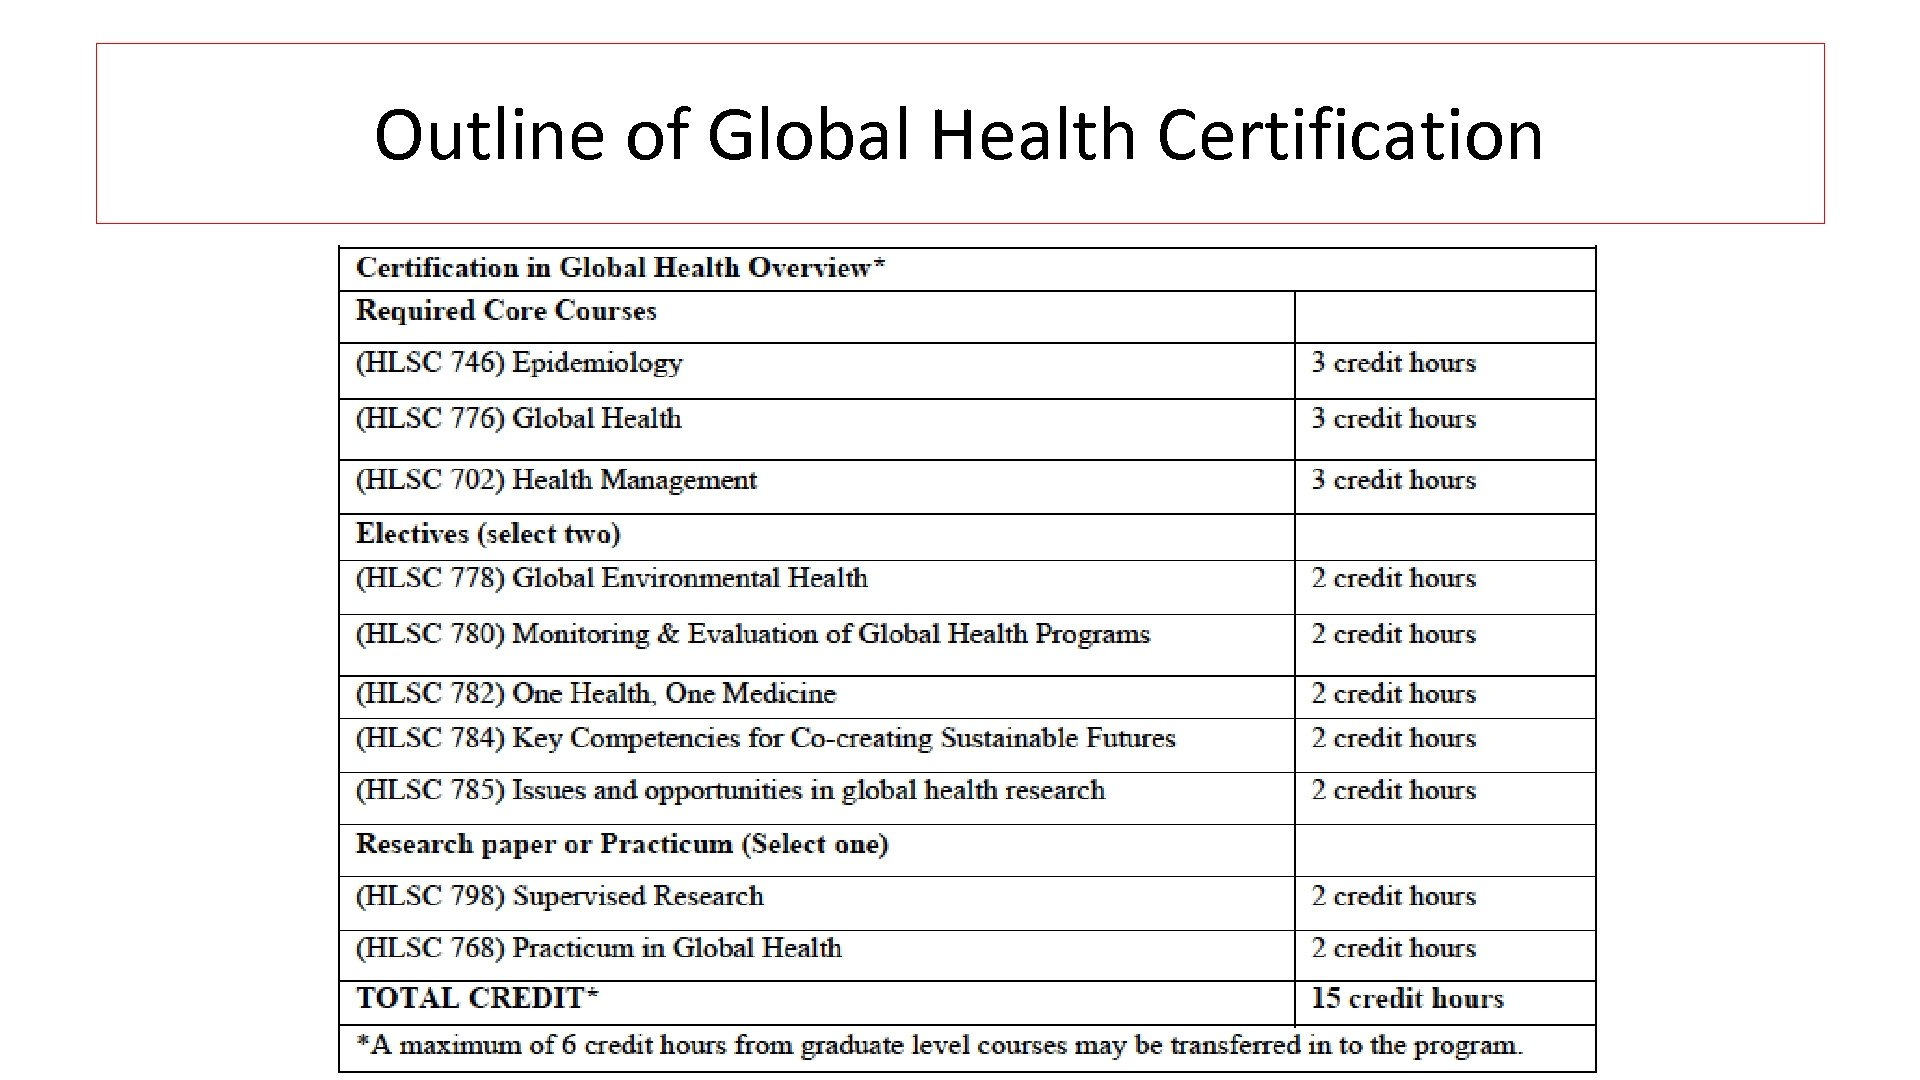 Outline of Global Health Certification